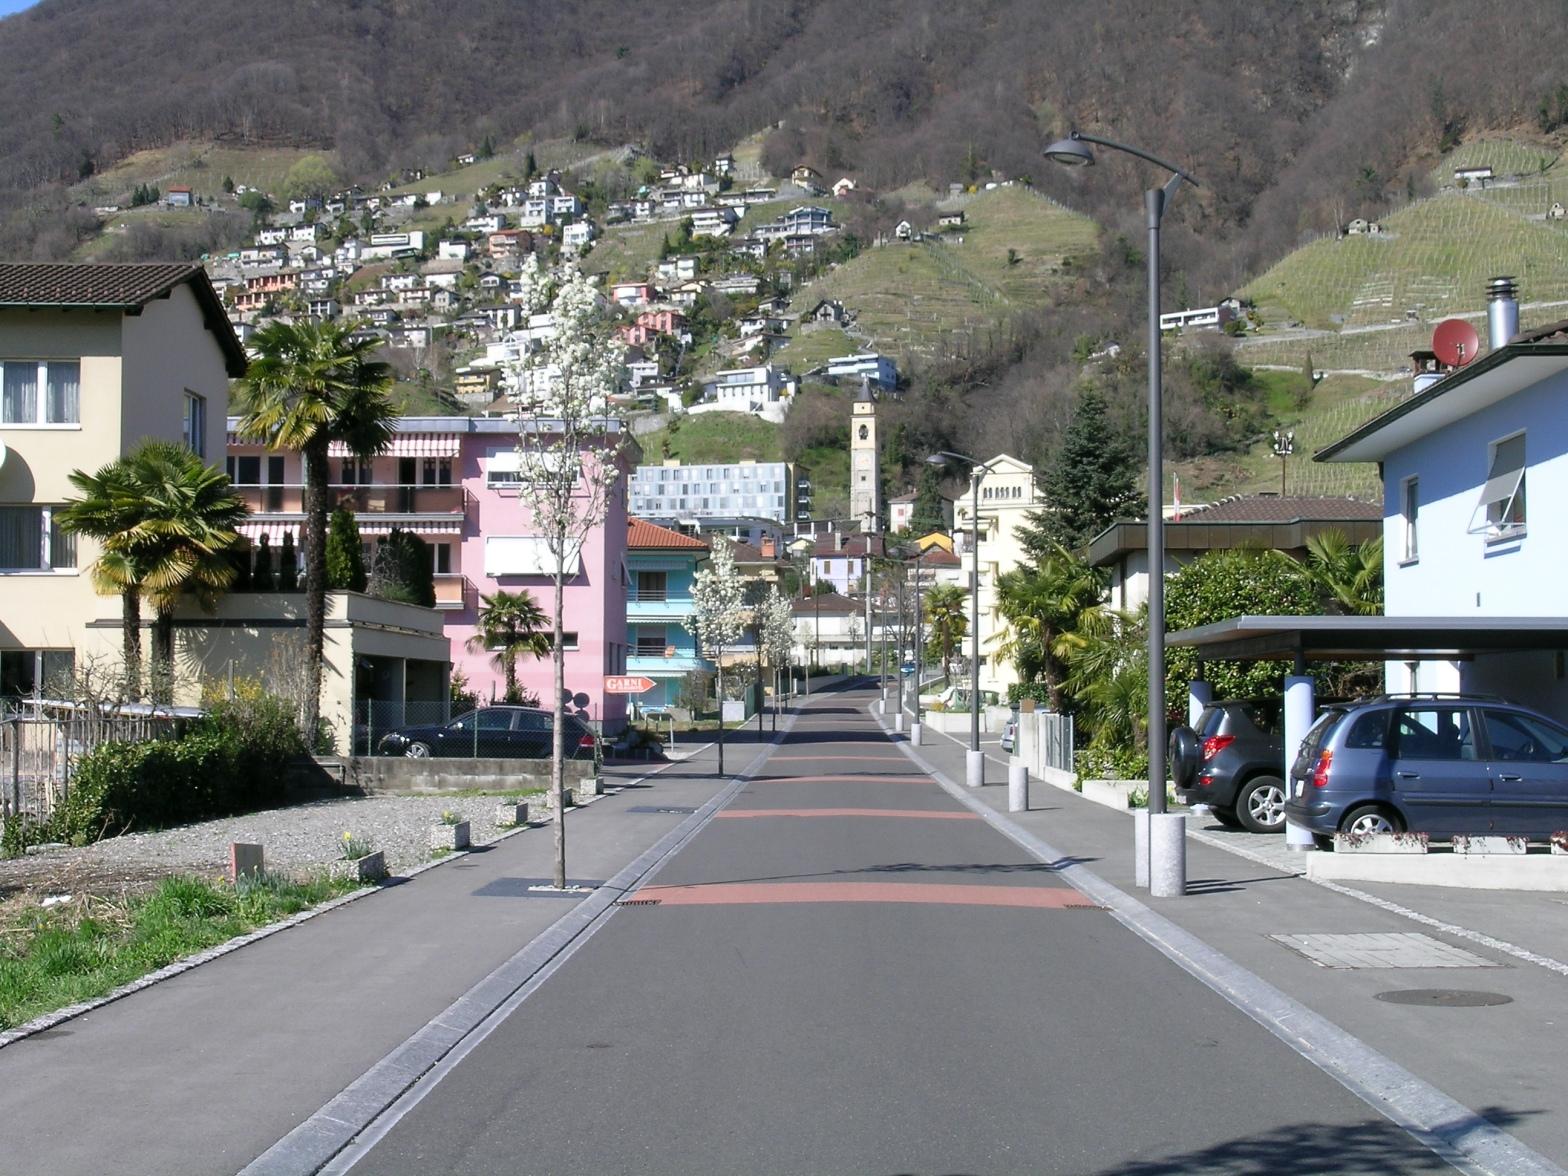 Gordola - Via Centro Sportivo